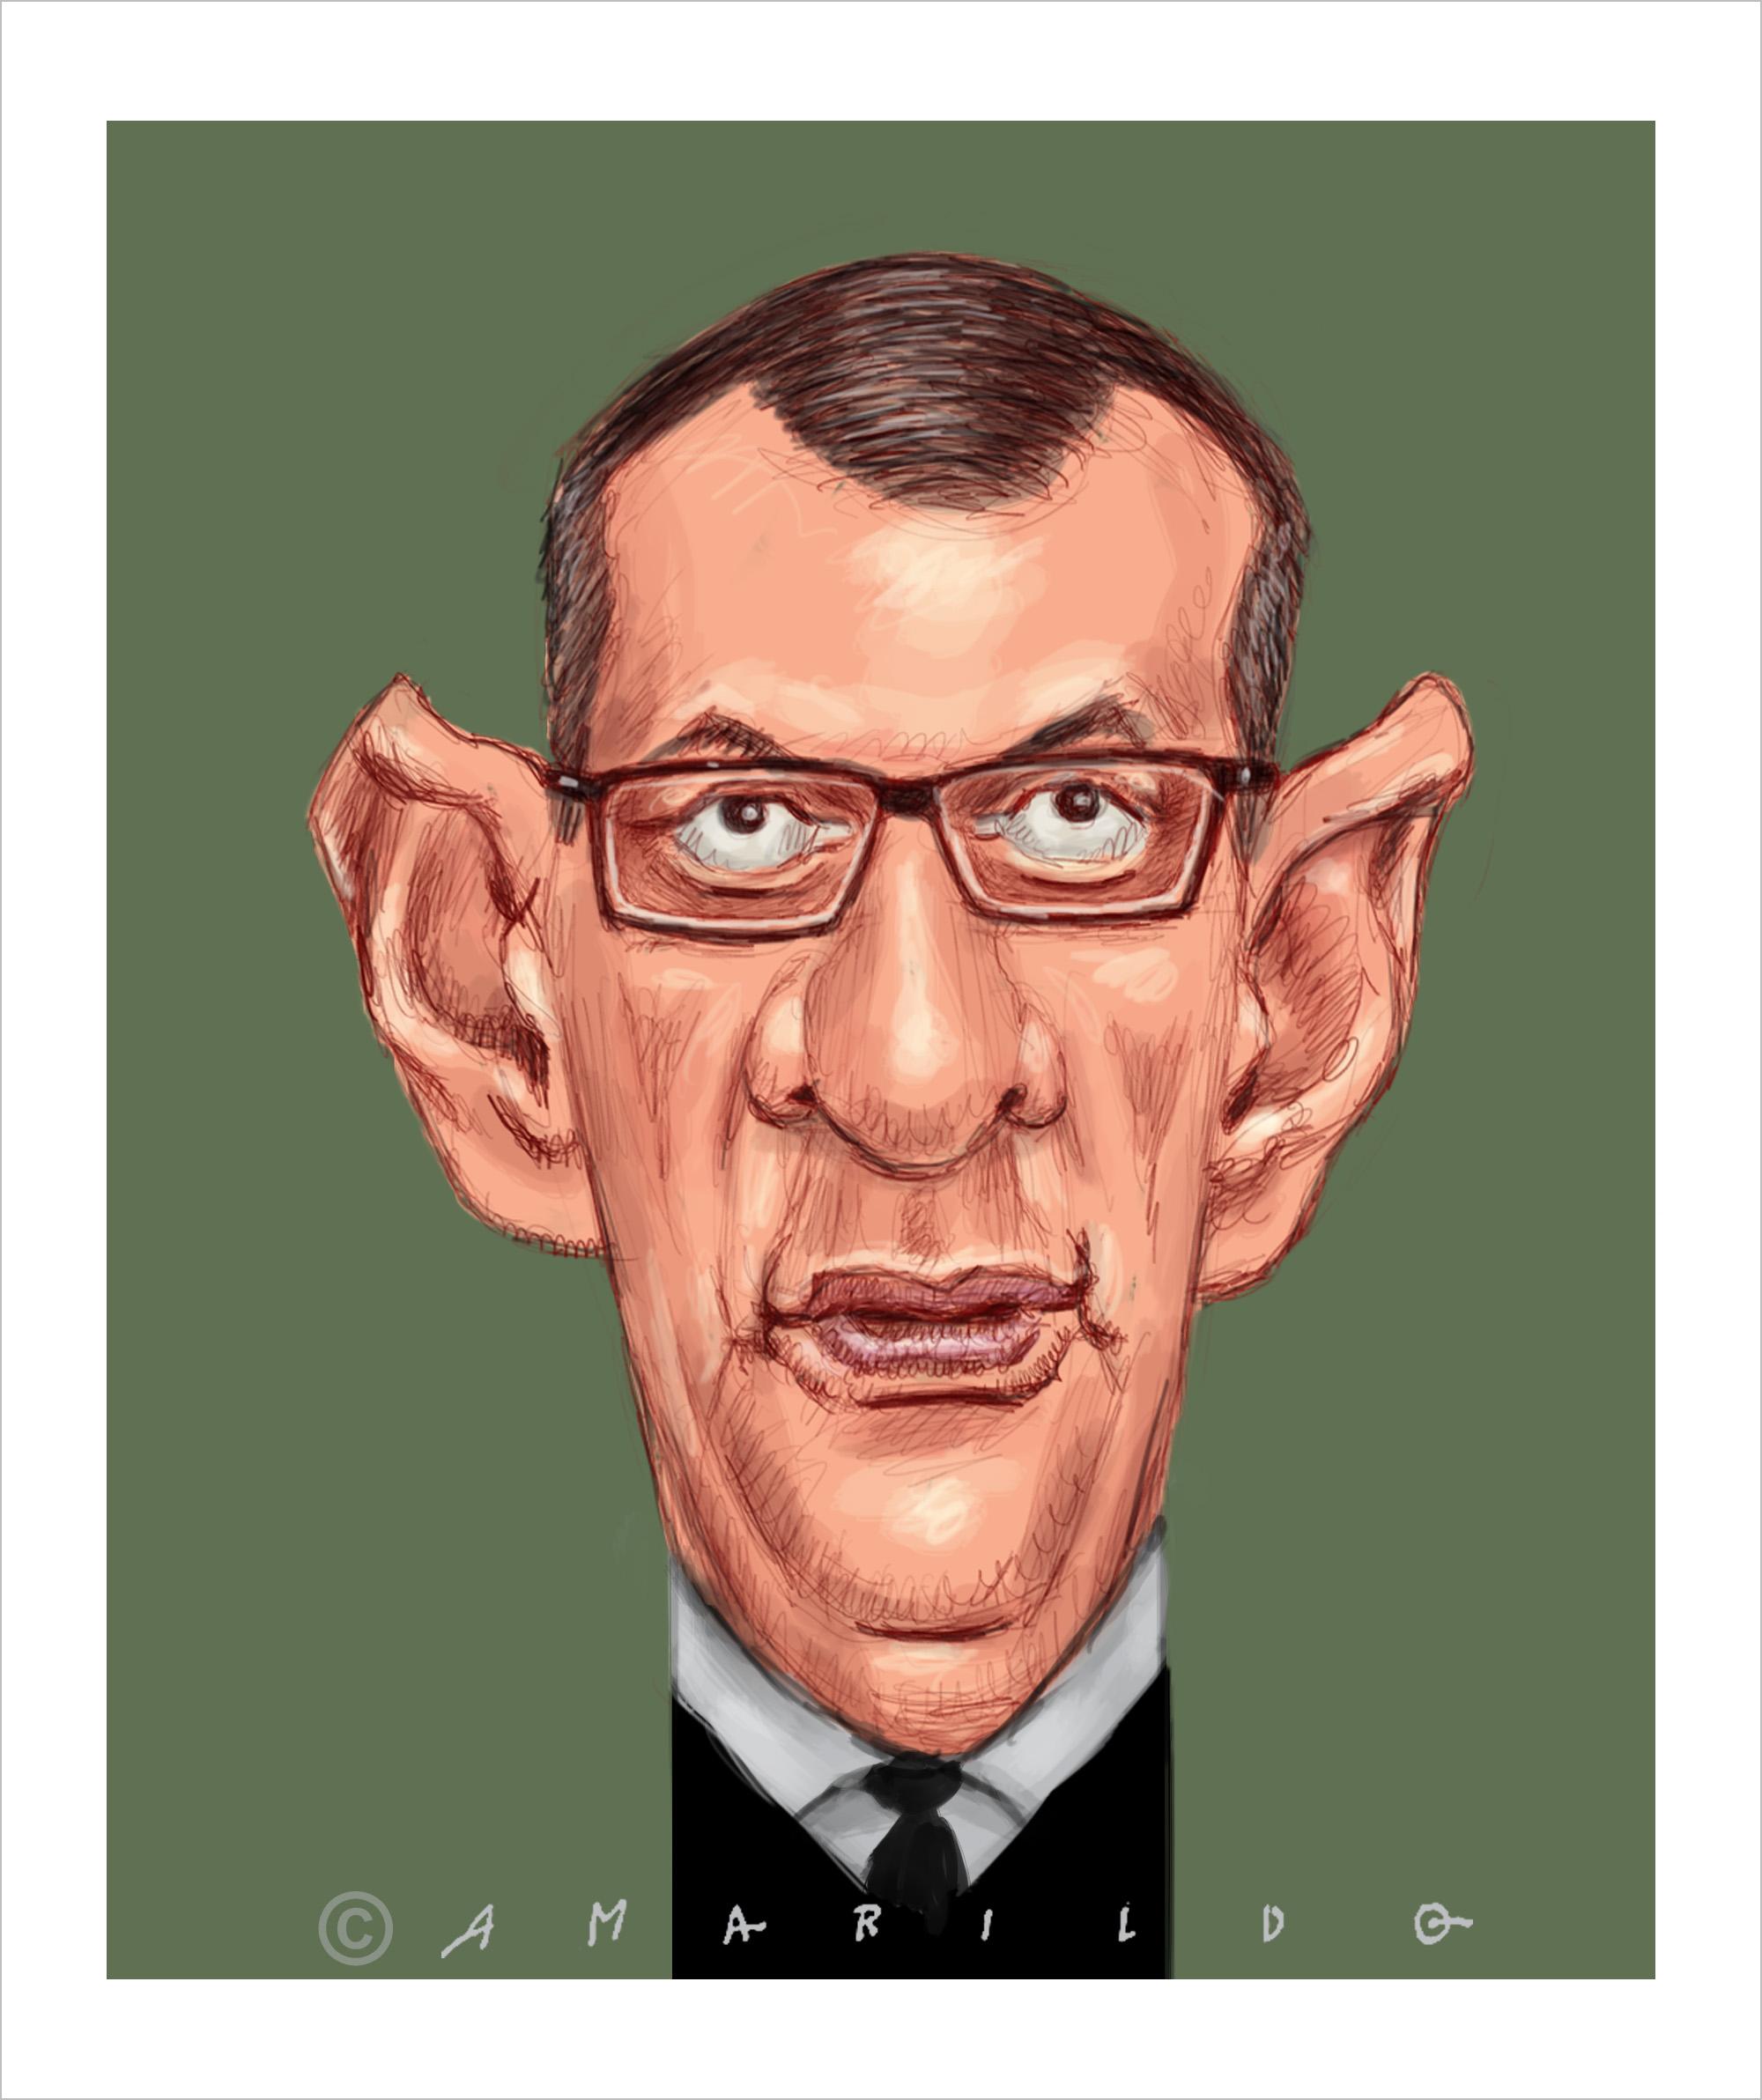 Caricatura: Rêgo Barros. . Exonerado do cargo de porta-voz da Presidência (extinto). #regobarros #exonerado #portavoz #presidenciadarepublica #bplsonaro #general